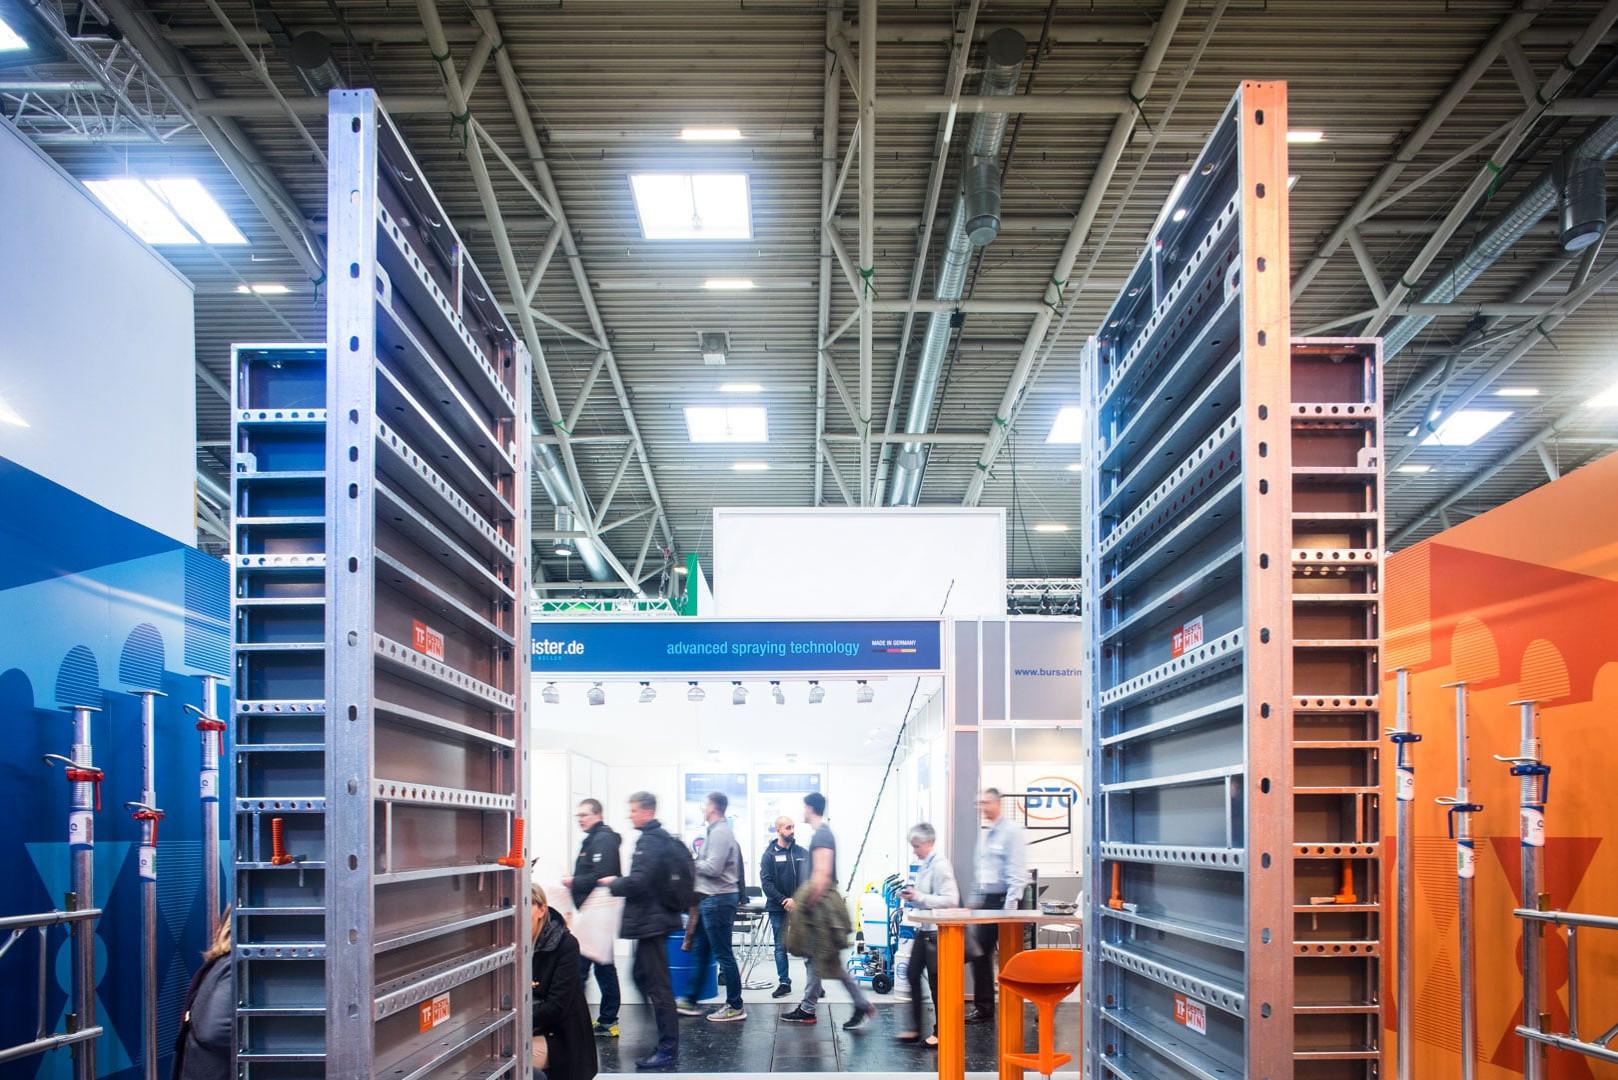 Bauma 2019 Fair In Munich | Farina Formworks